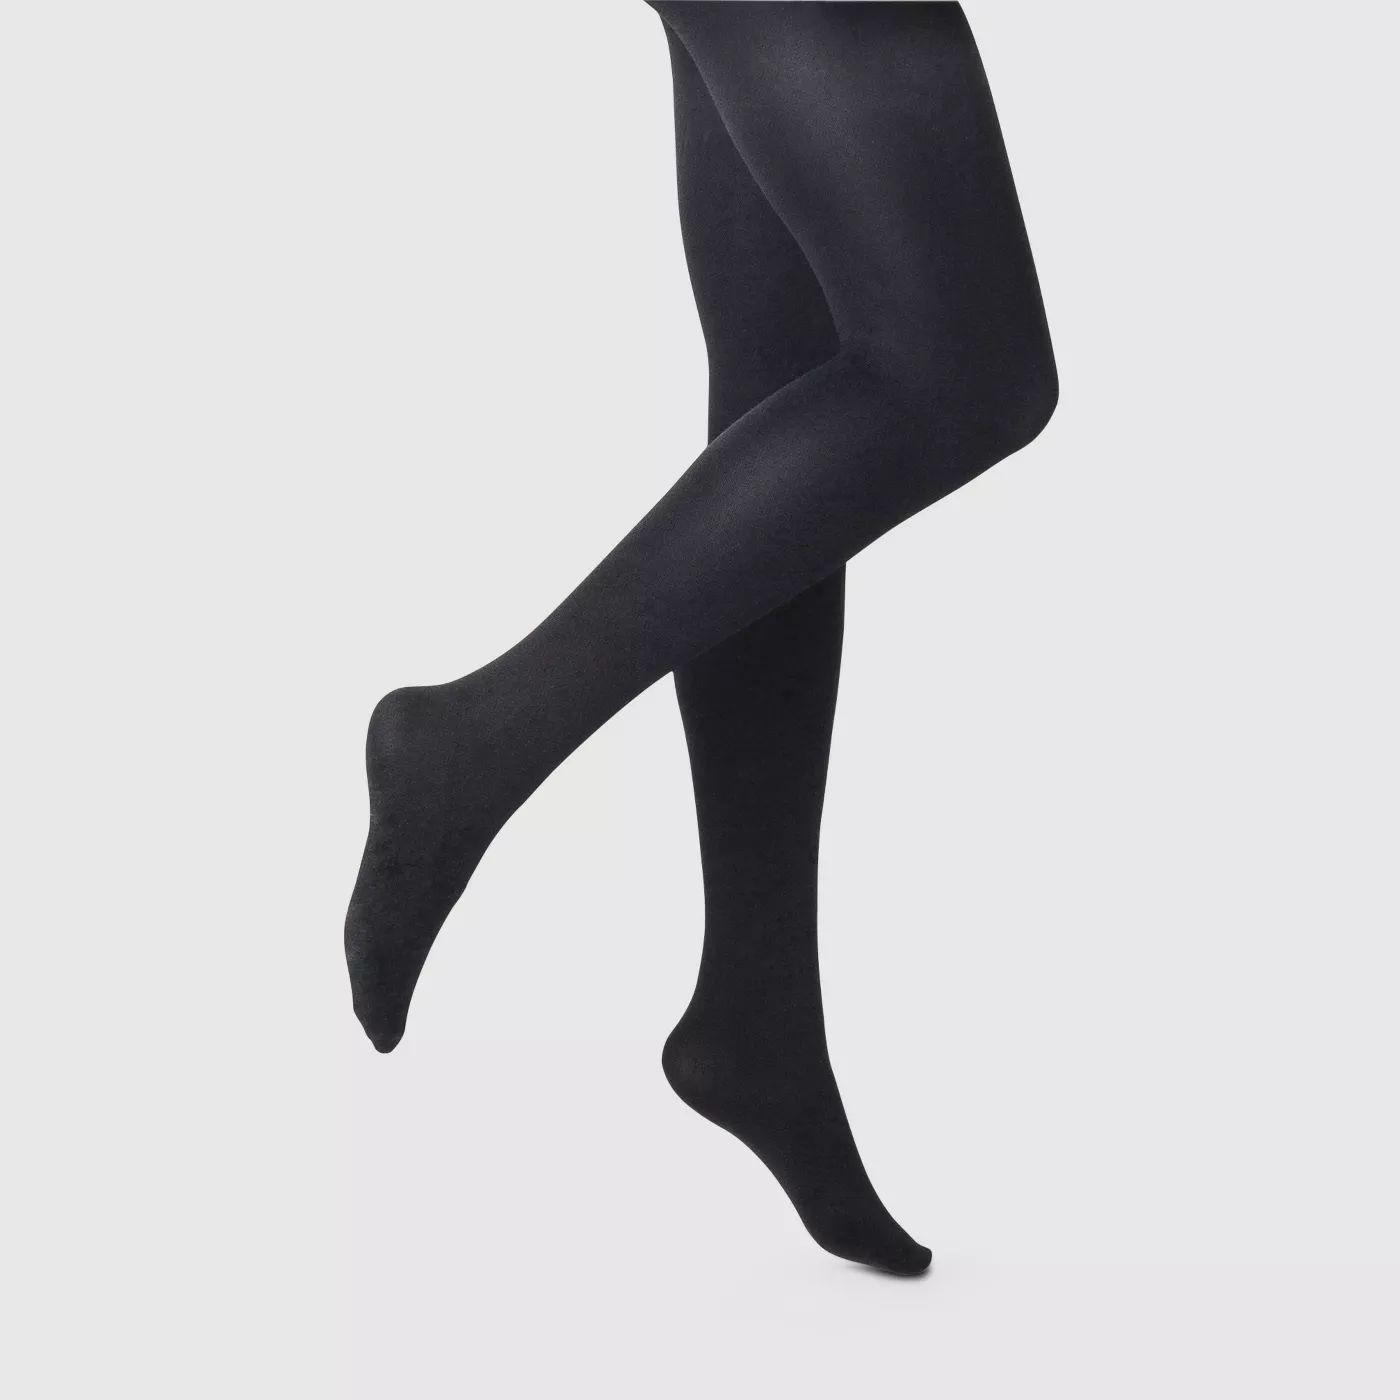 Size Medium Control top clingy sheer legs Pantyhose Off Black nylon tights